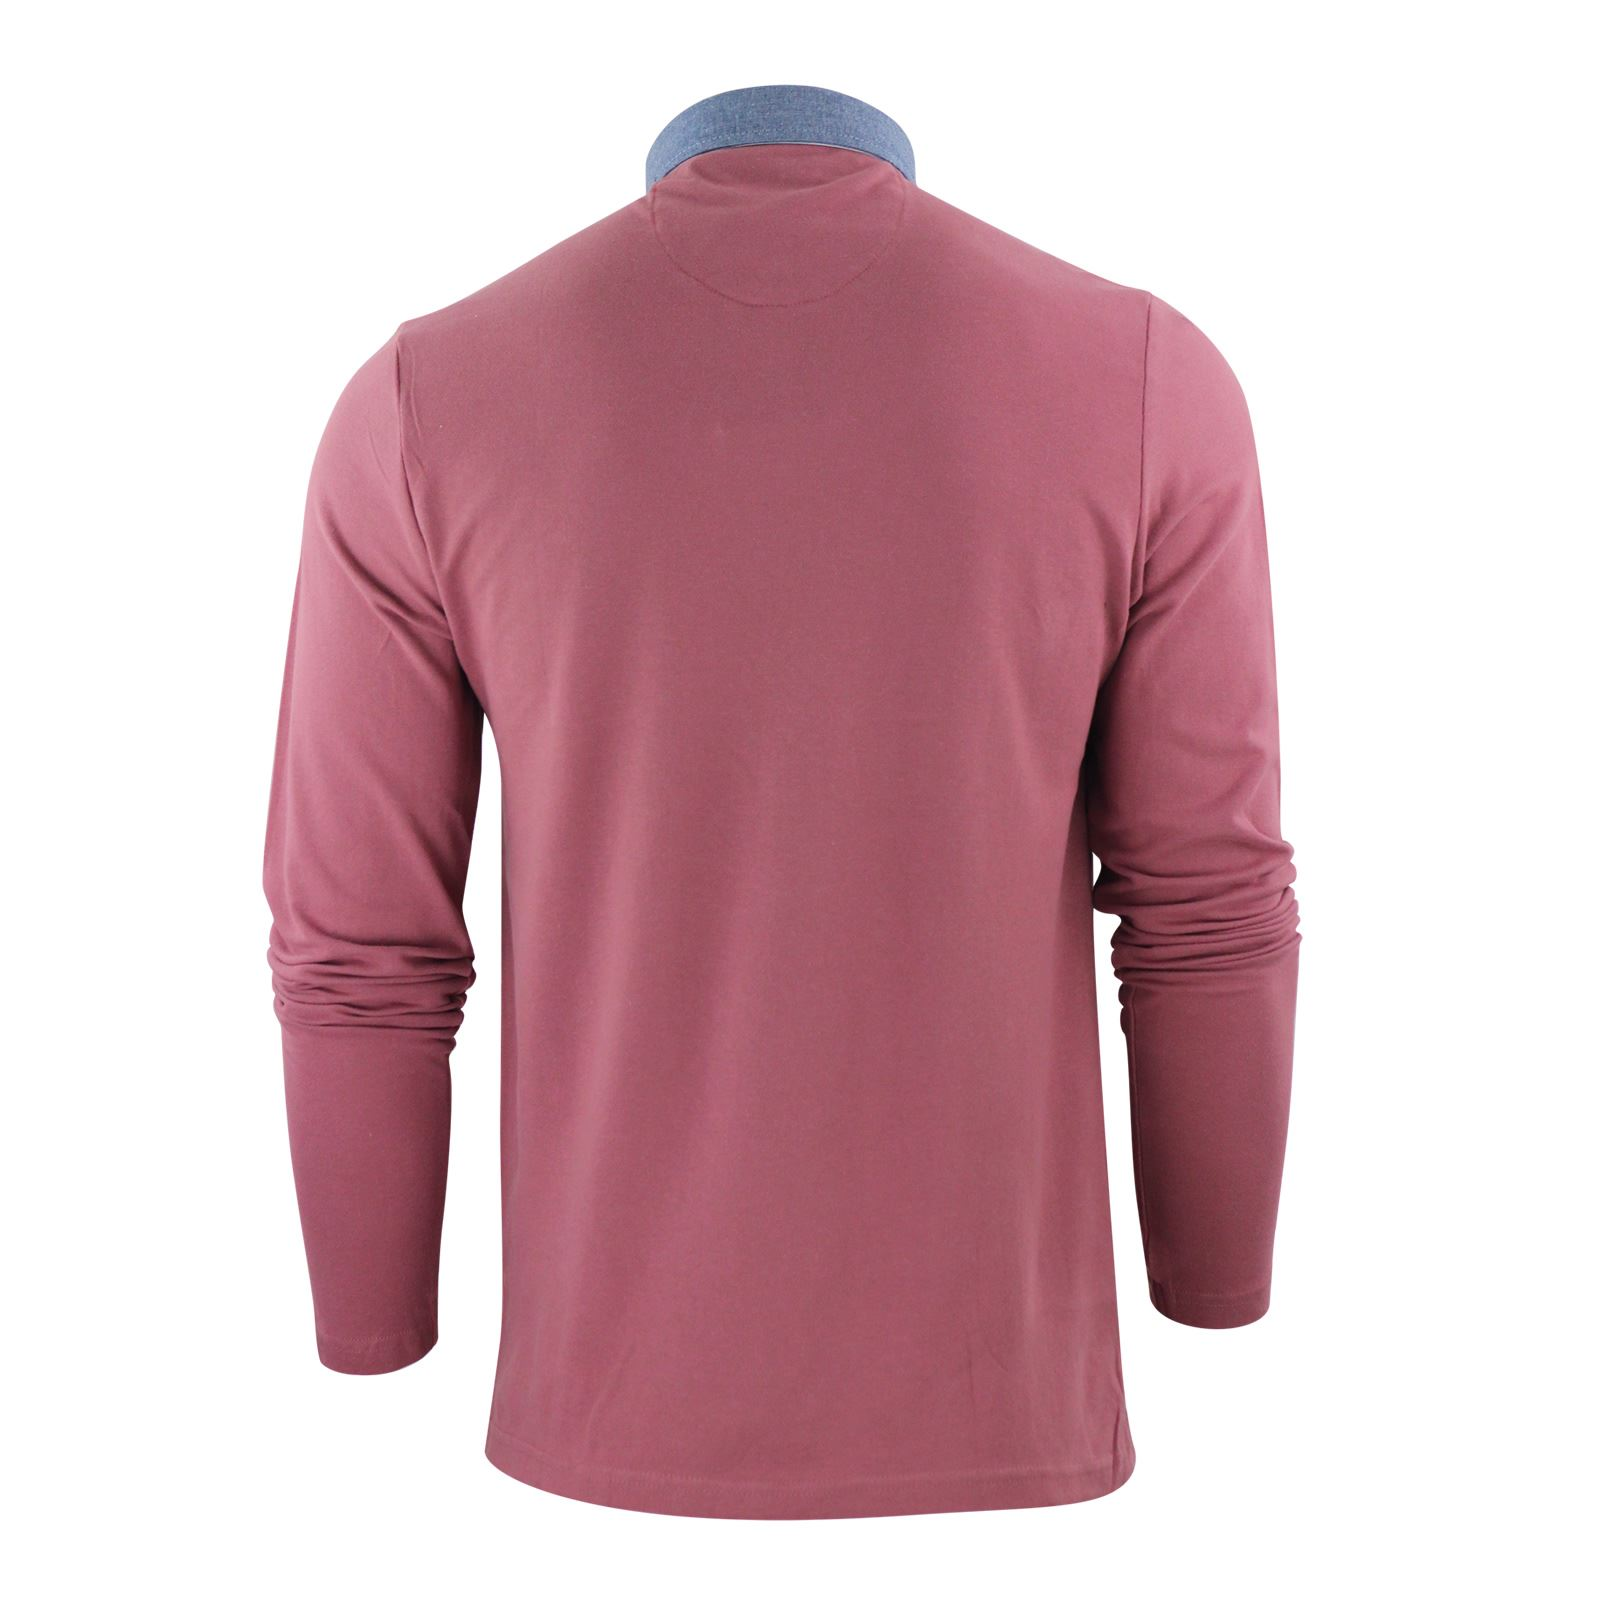 Para-Hombre-Polo-T-Shirt-Alma-valiente-Hera-Manga-Larga-De-Algodon-Casual-Top miniatura 12